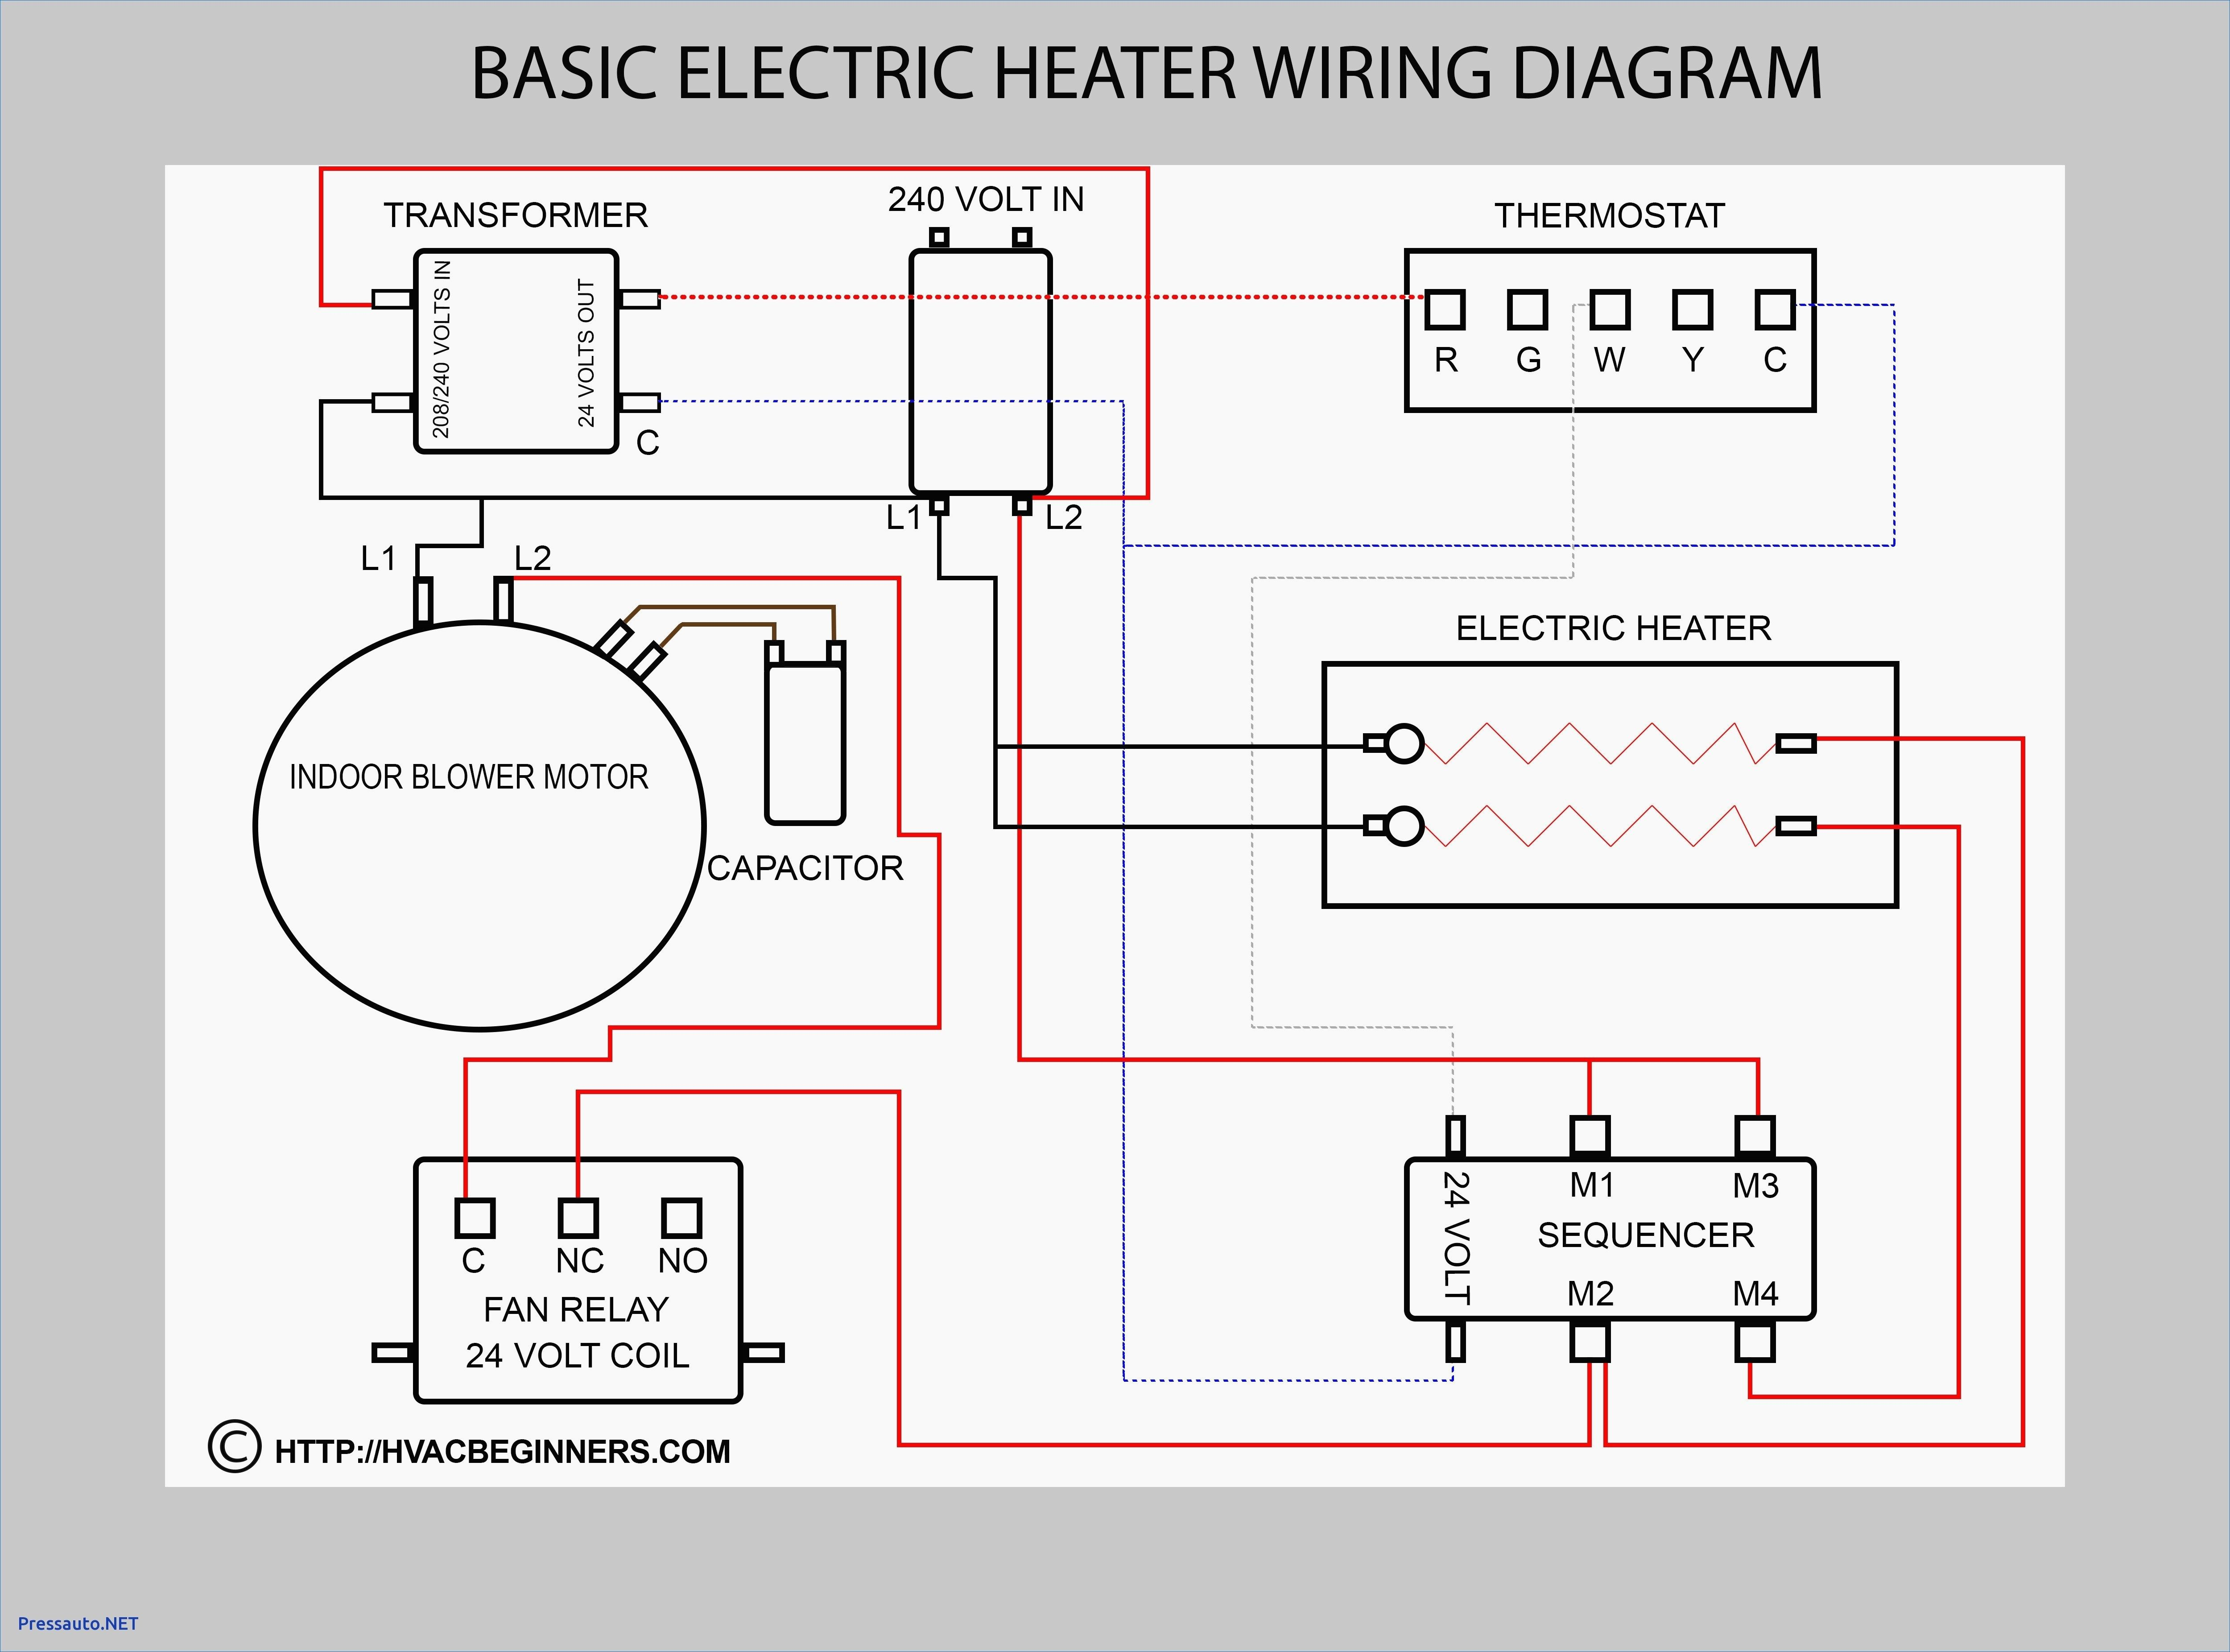 medium resolution of wiring diagram 220 volt campbell hausfeld wiring diagram meta 220 volt air compressor wiring diagram 240 volt air compressor wiring diagram